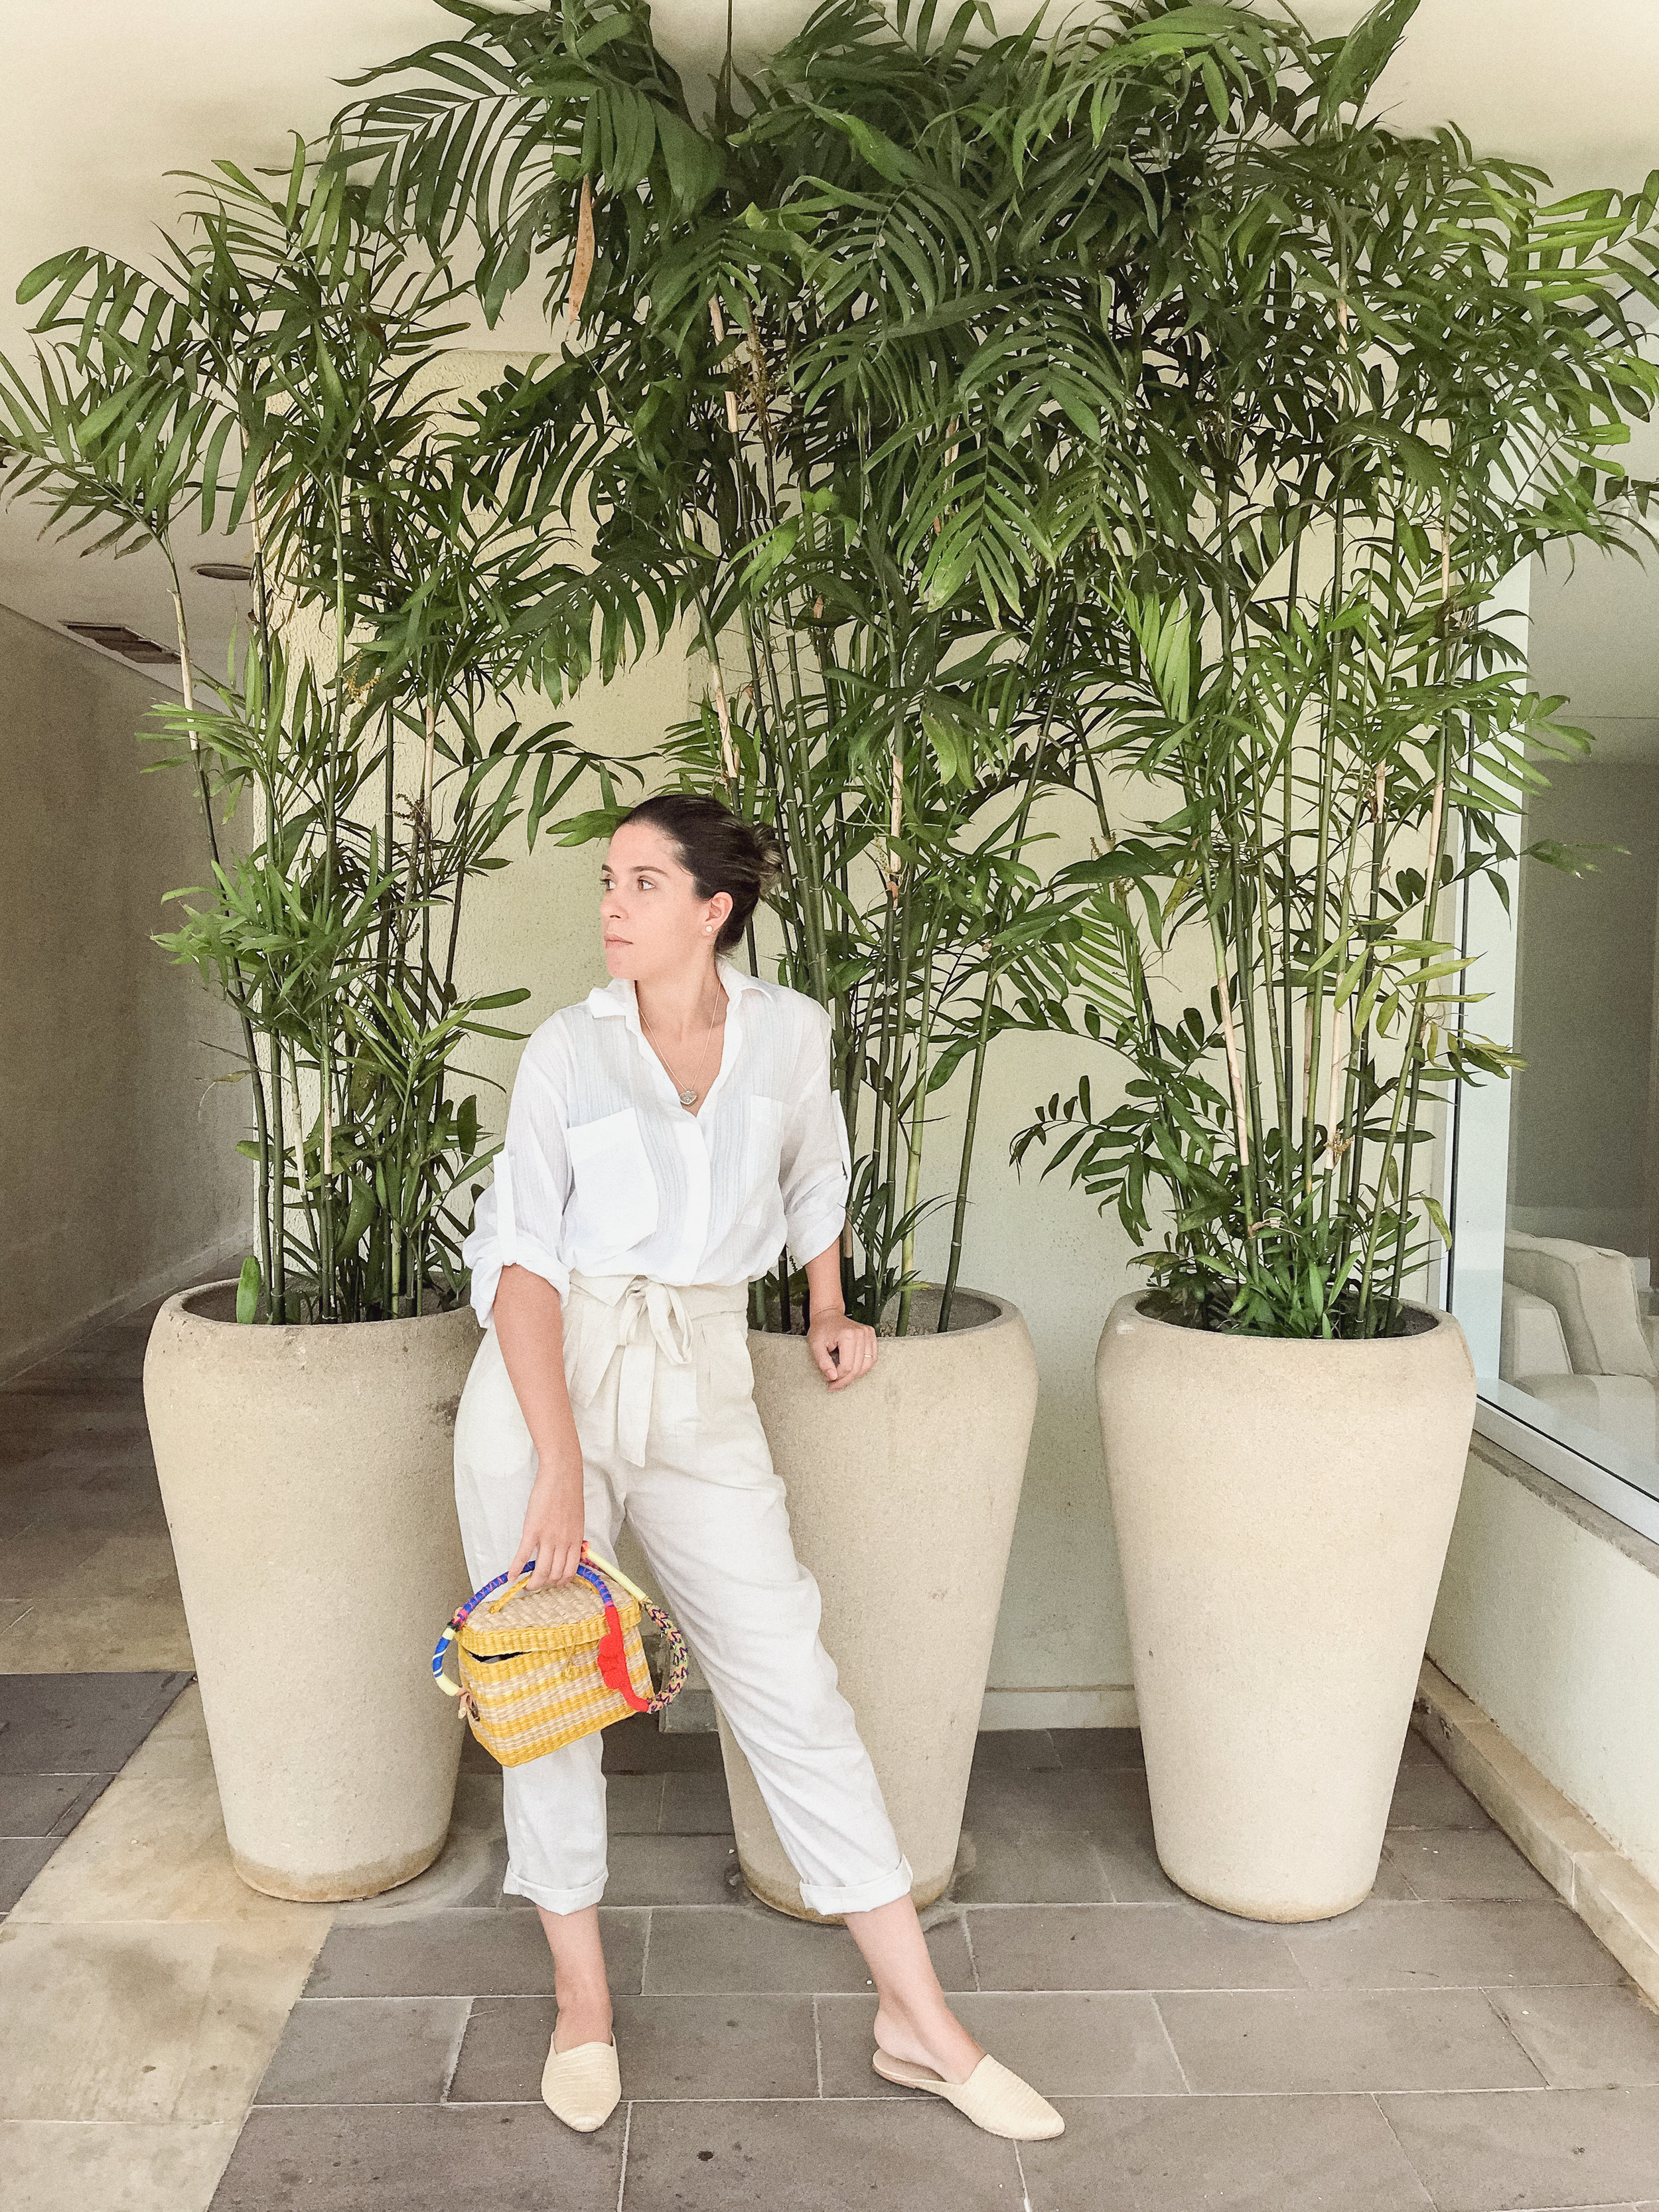 IMG 3035 2 - Looks da Semana: Poliana Almeida